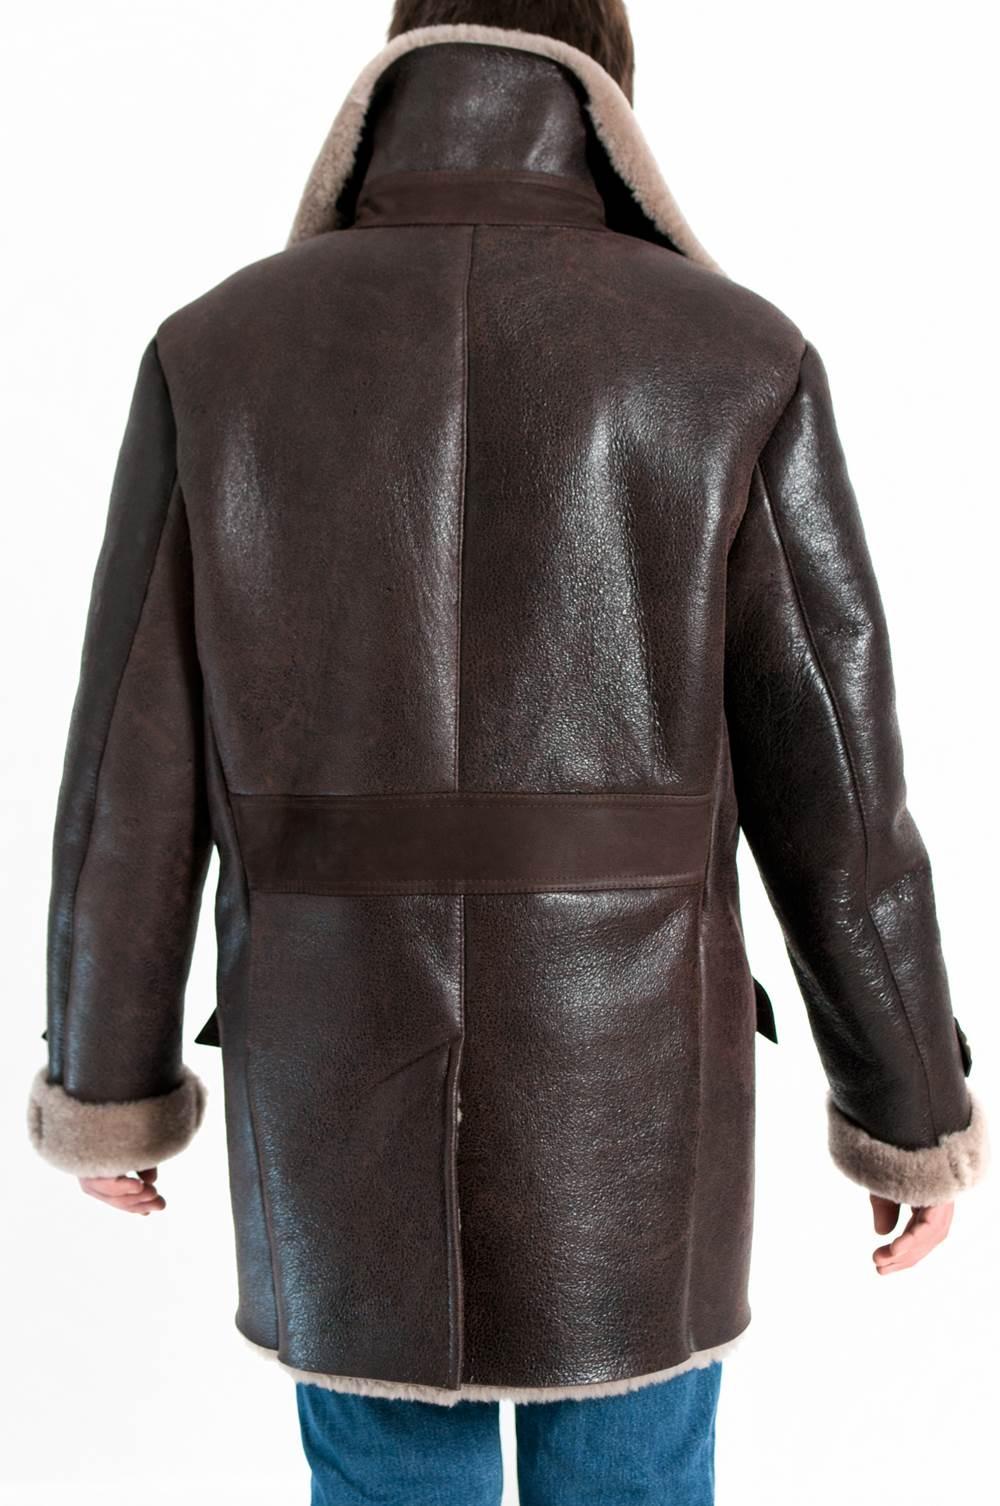 39 korto df 39 manteau peau de mouton retourn bombardier. Black Bedroom Furniture Sets. Home Design Ideas